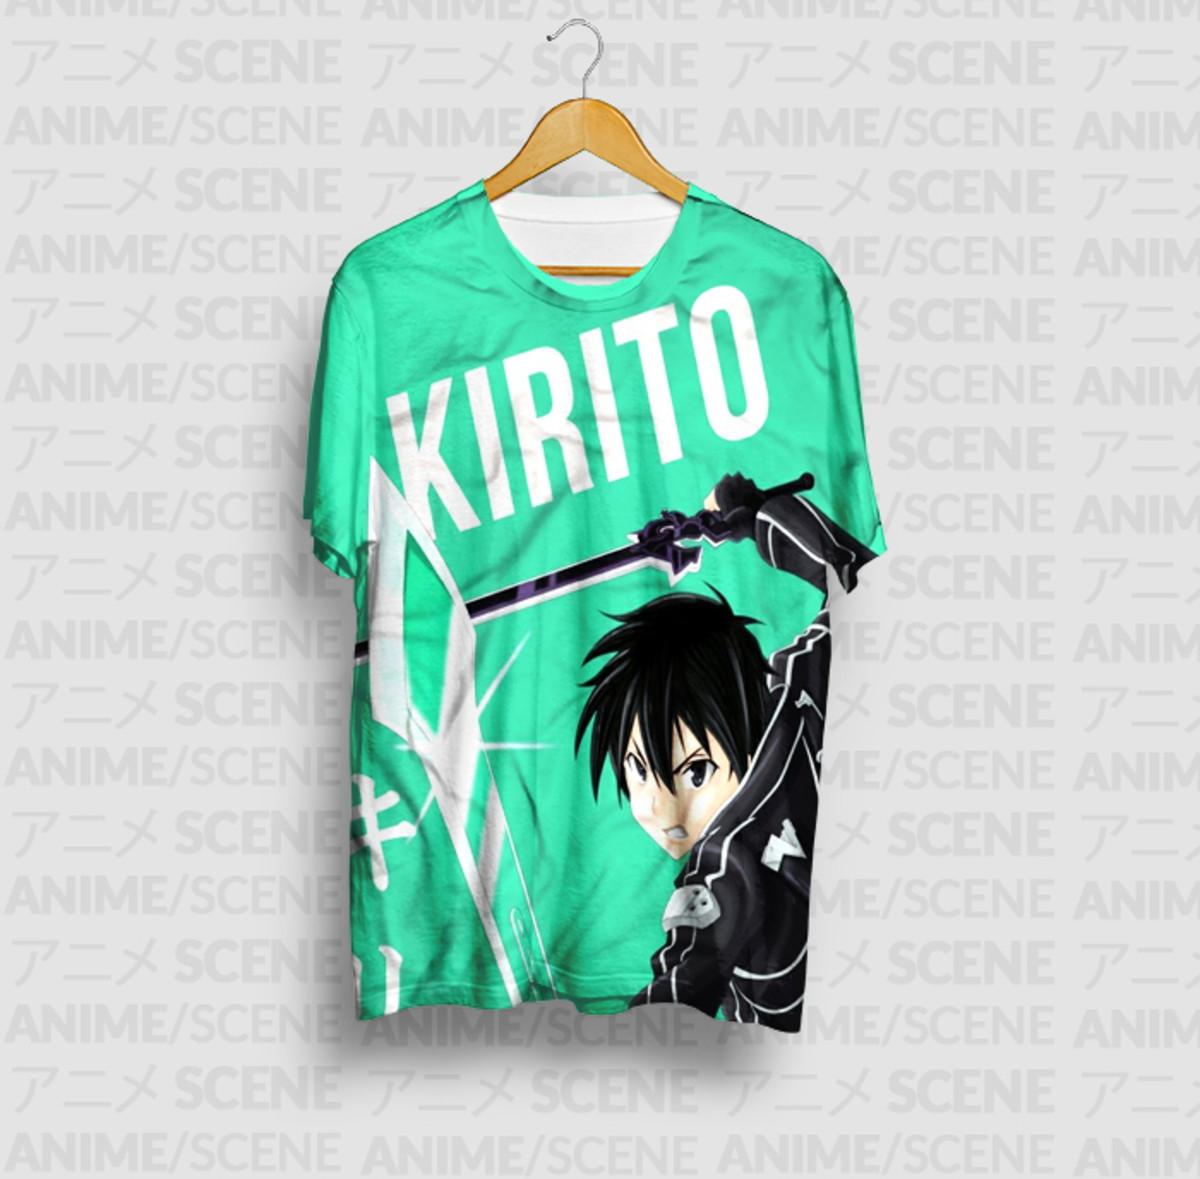 1bf2f9a64 Camiseta Kirito Name - Sword Art Online no Elo7